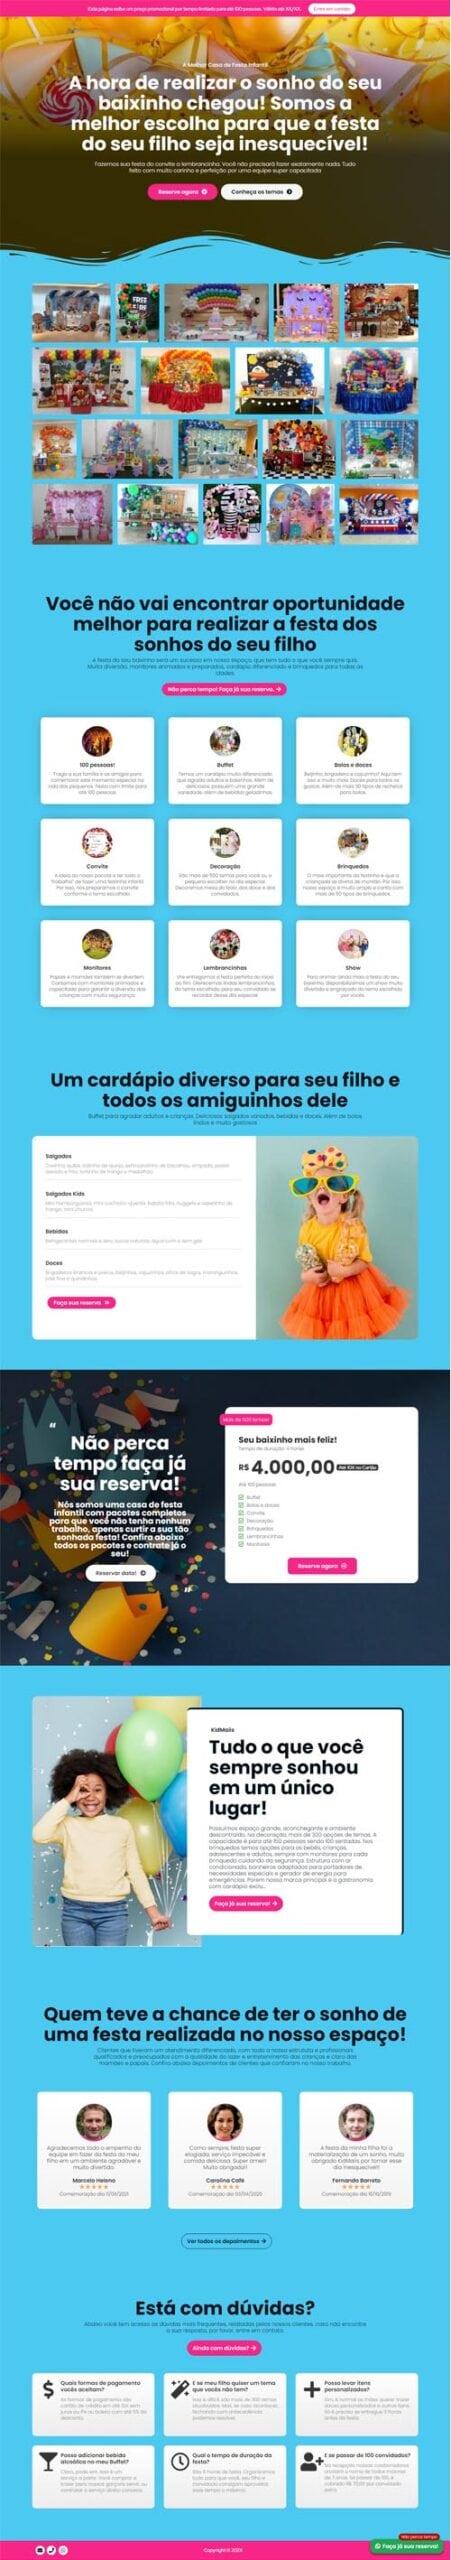 Página inicial KidMaiis - Modelo de landing page para vendas de serviços